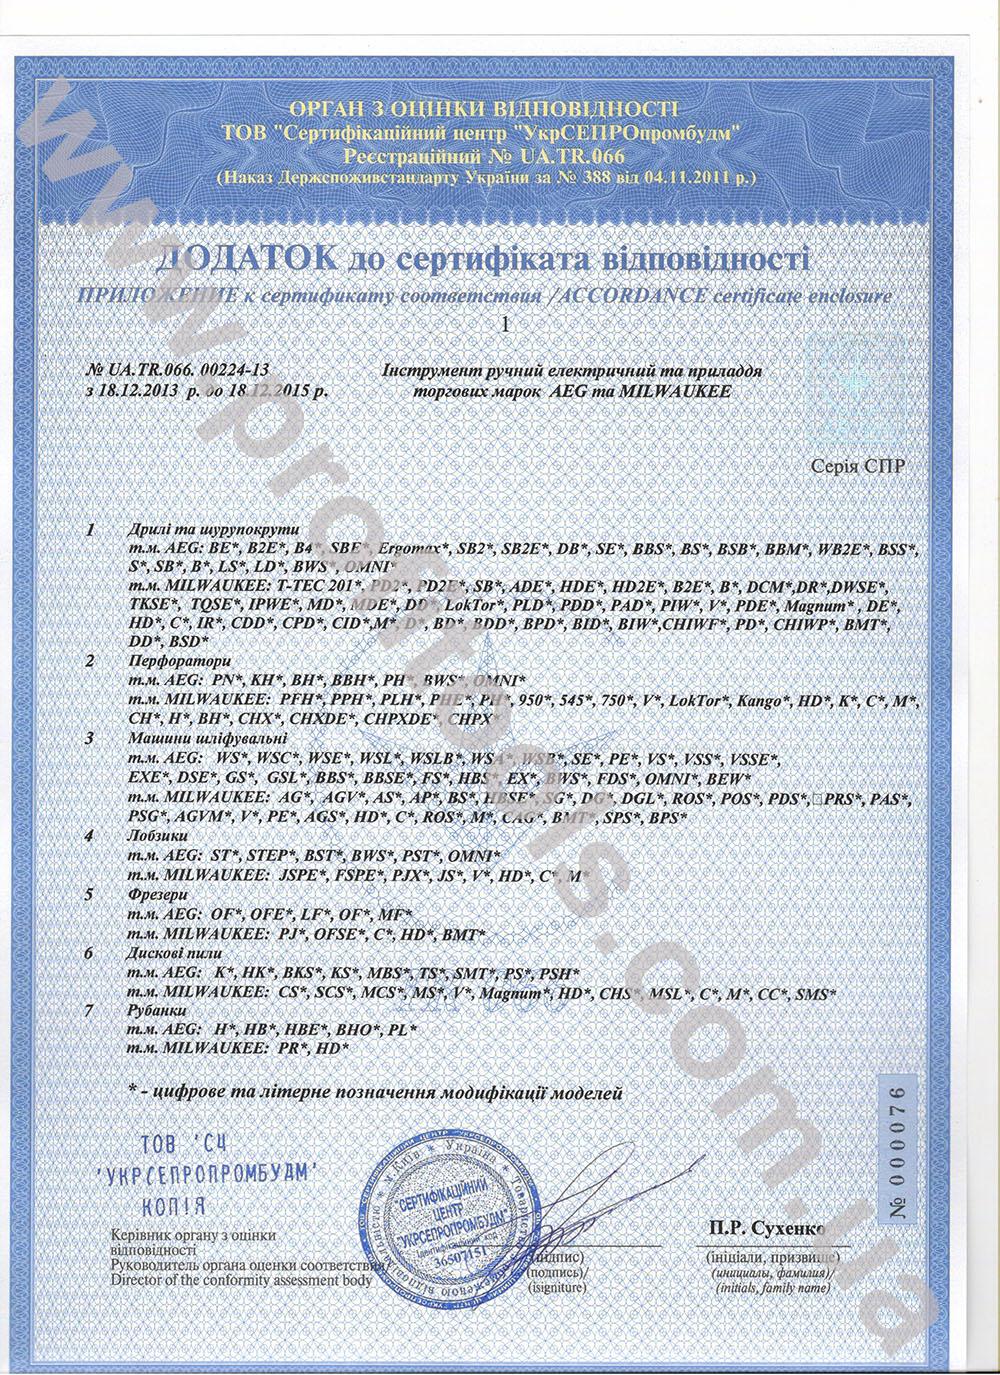 shares/Certificate/TTI/1.jpg